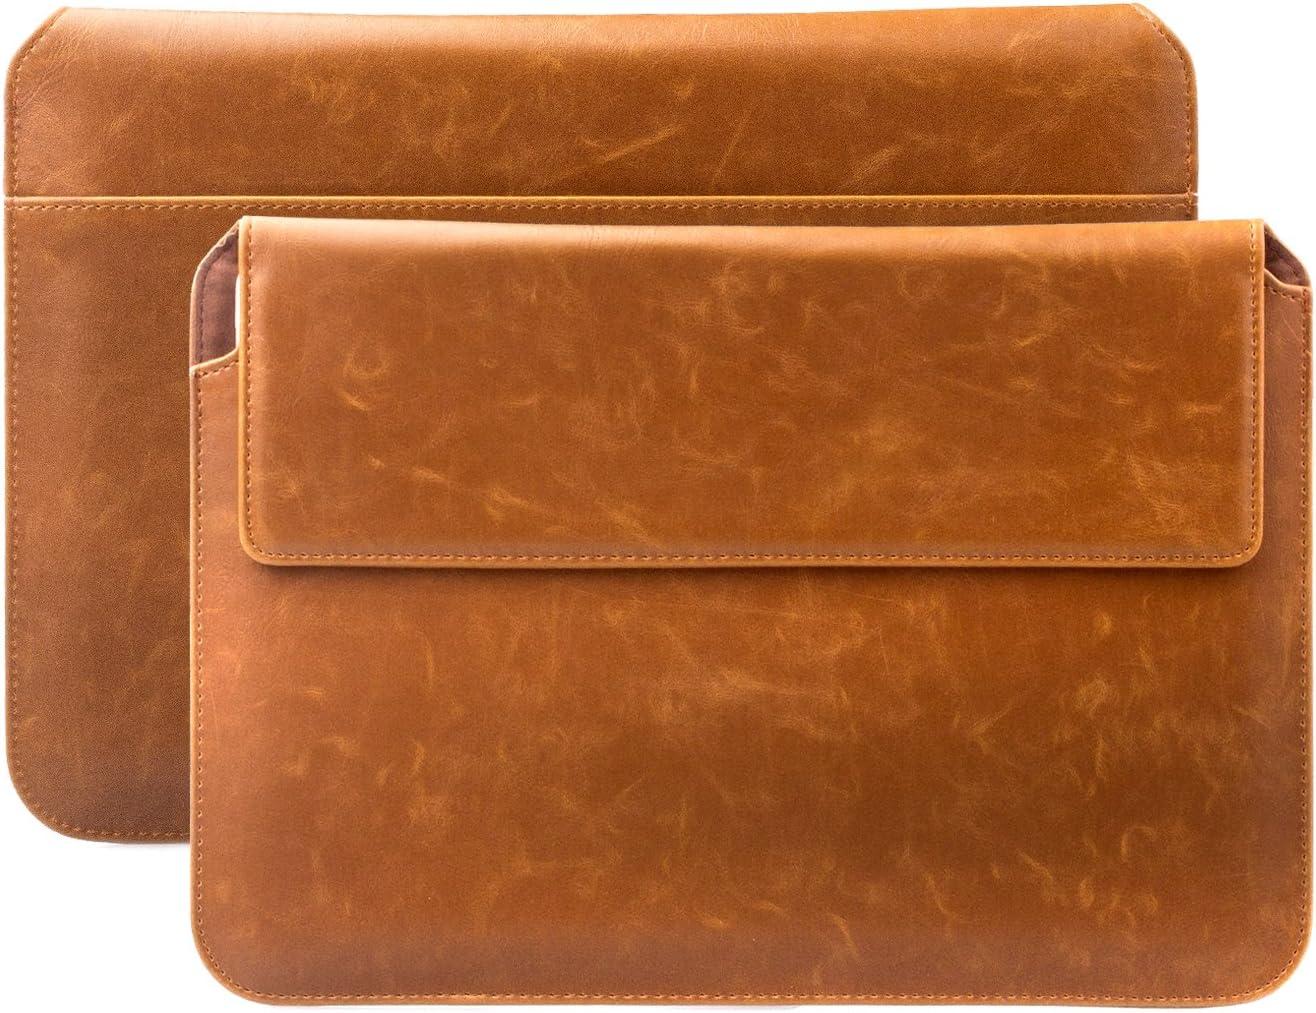 Icues Schutzhülle Kompatibel Mit Apple Ipad Air 2 Case Samsung Galaxy Tab S3 S2 9 7 Tasche